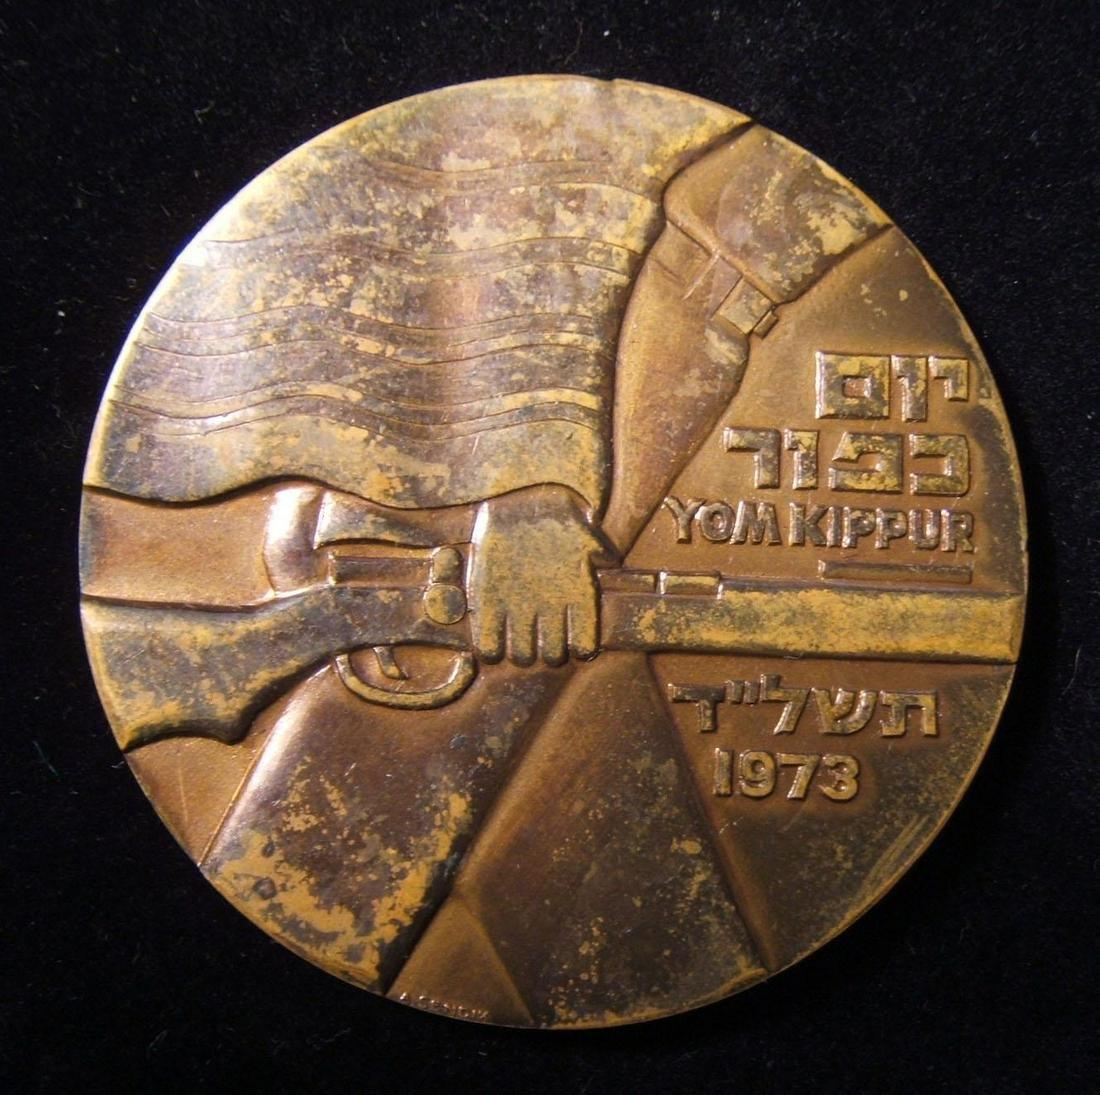 Israeli 1973 Yom Kippur War numbered medal of gratitude